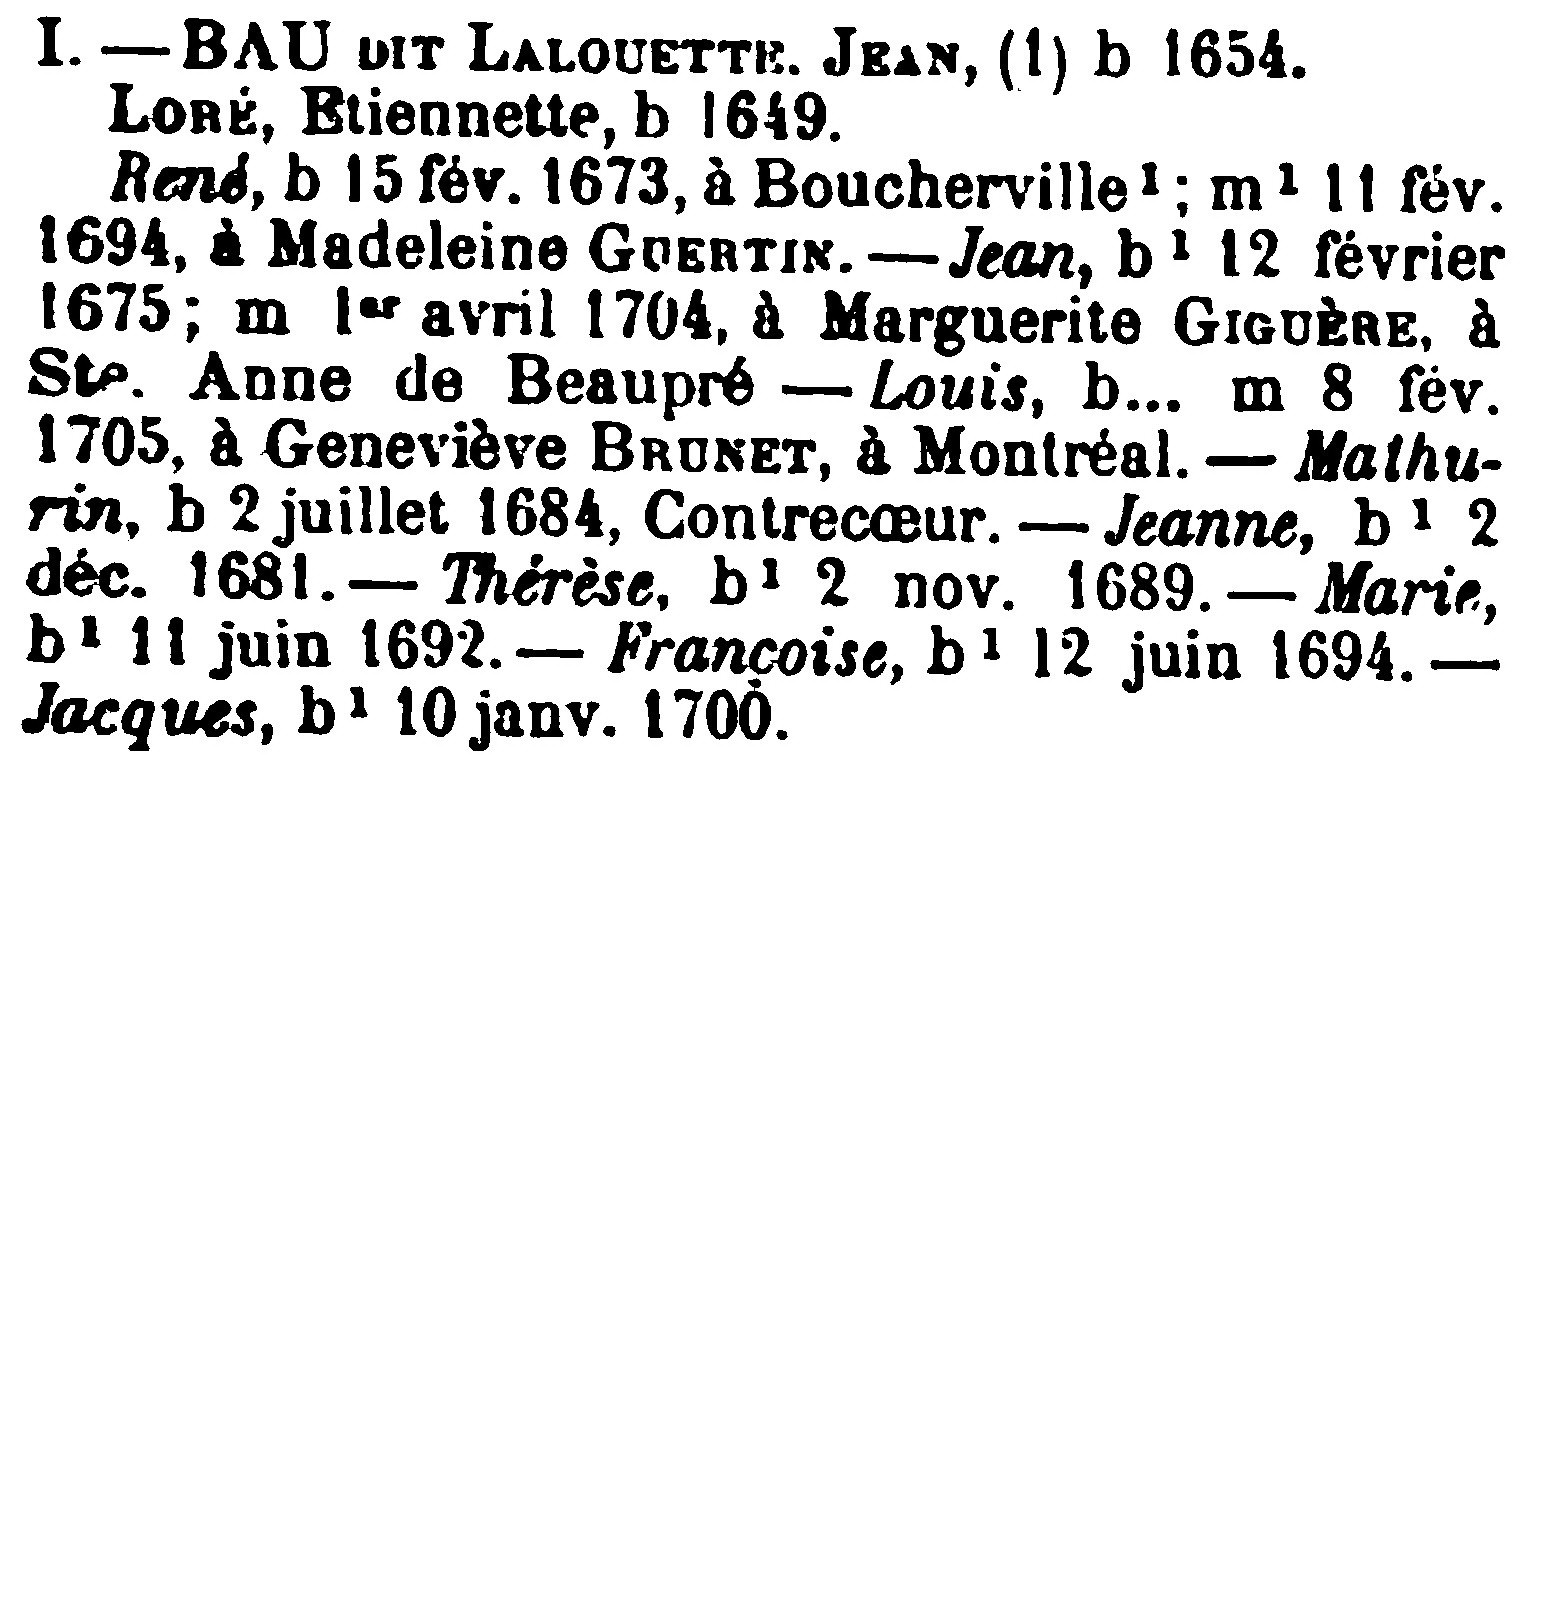 Jean Baptiste Lebeau